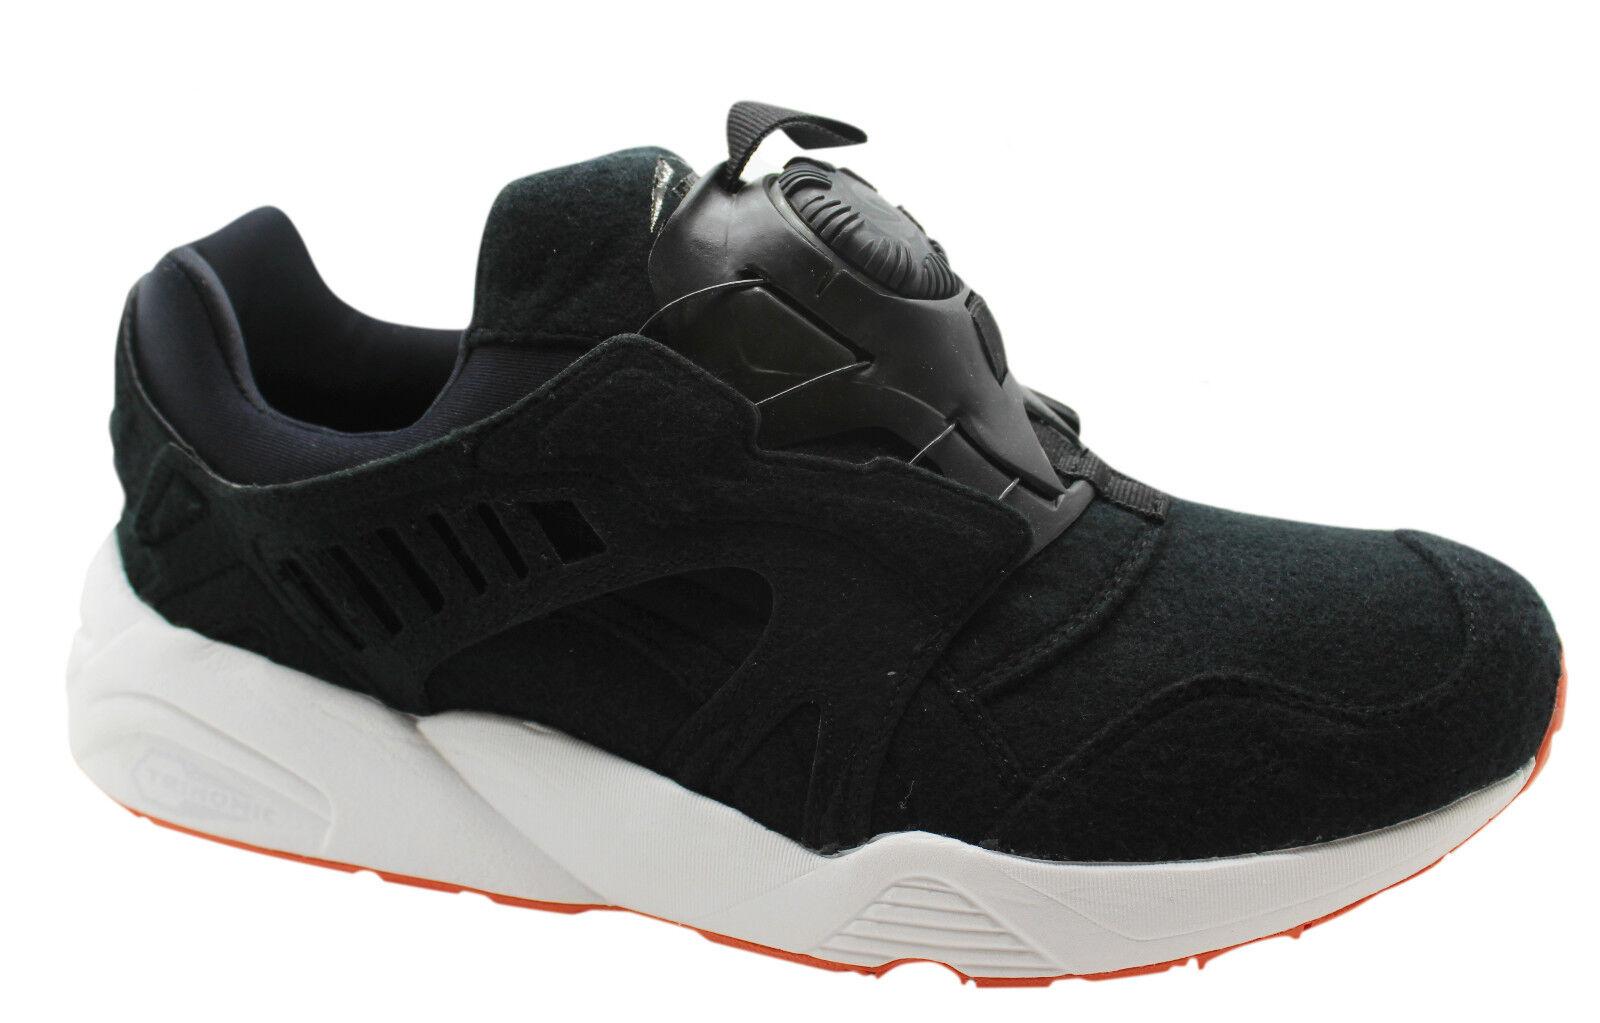 Puma Trinomic Disc Blaze Black Felt Mens Trainers Slip On Shoes 359361 02 D8